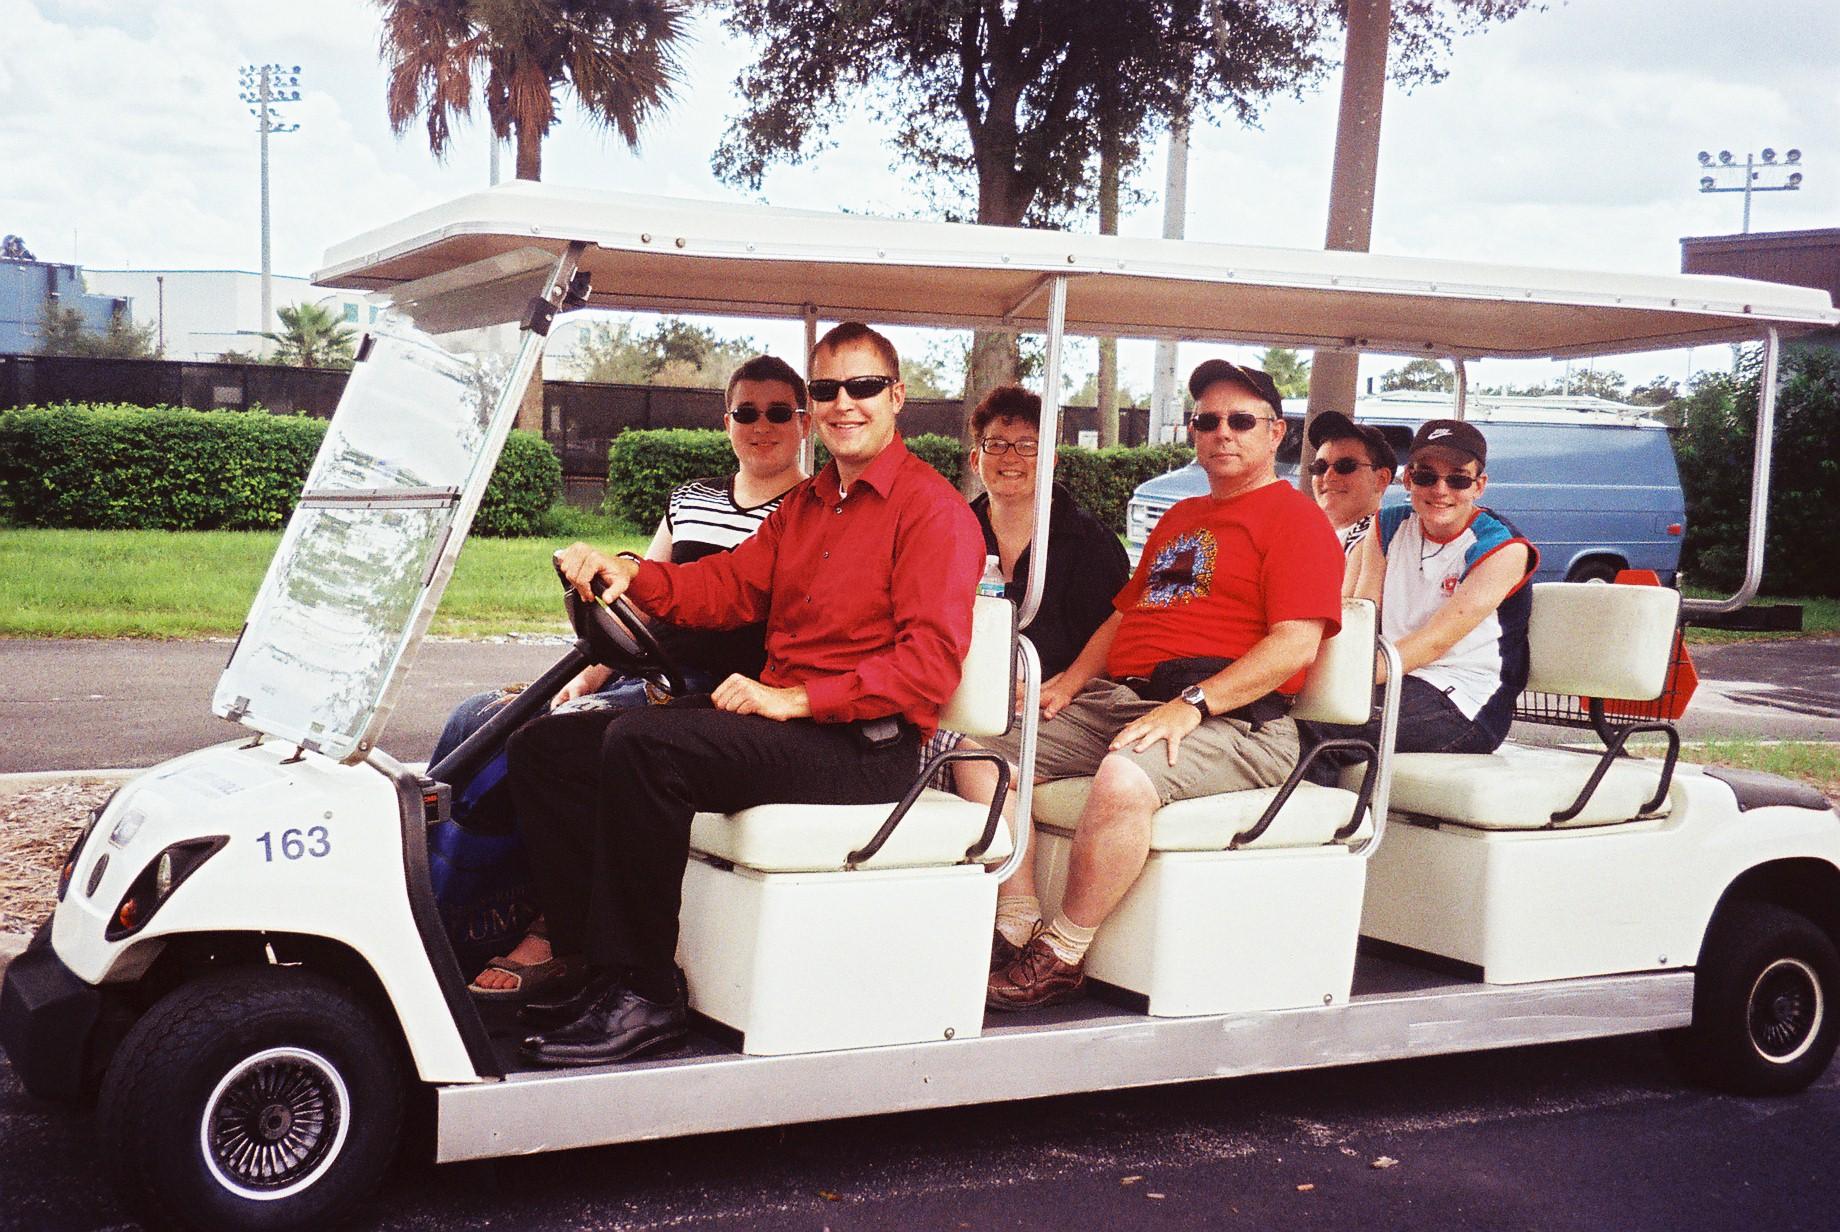 Daytona beach Chris cart tour ERAU 20aug09